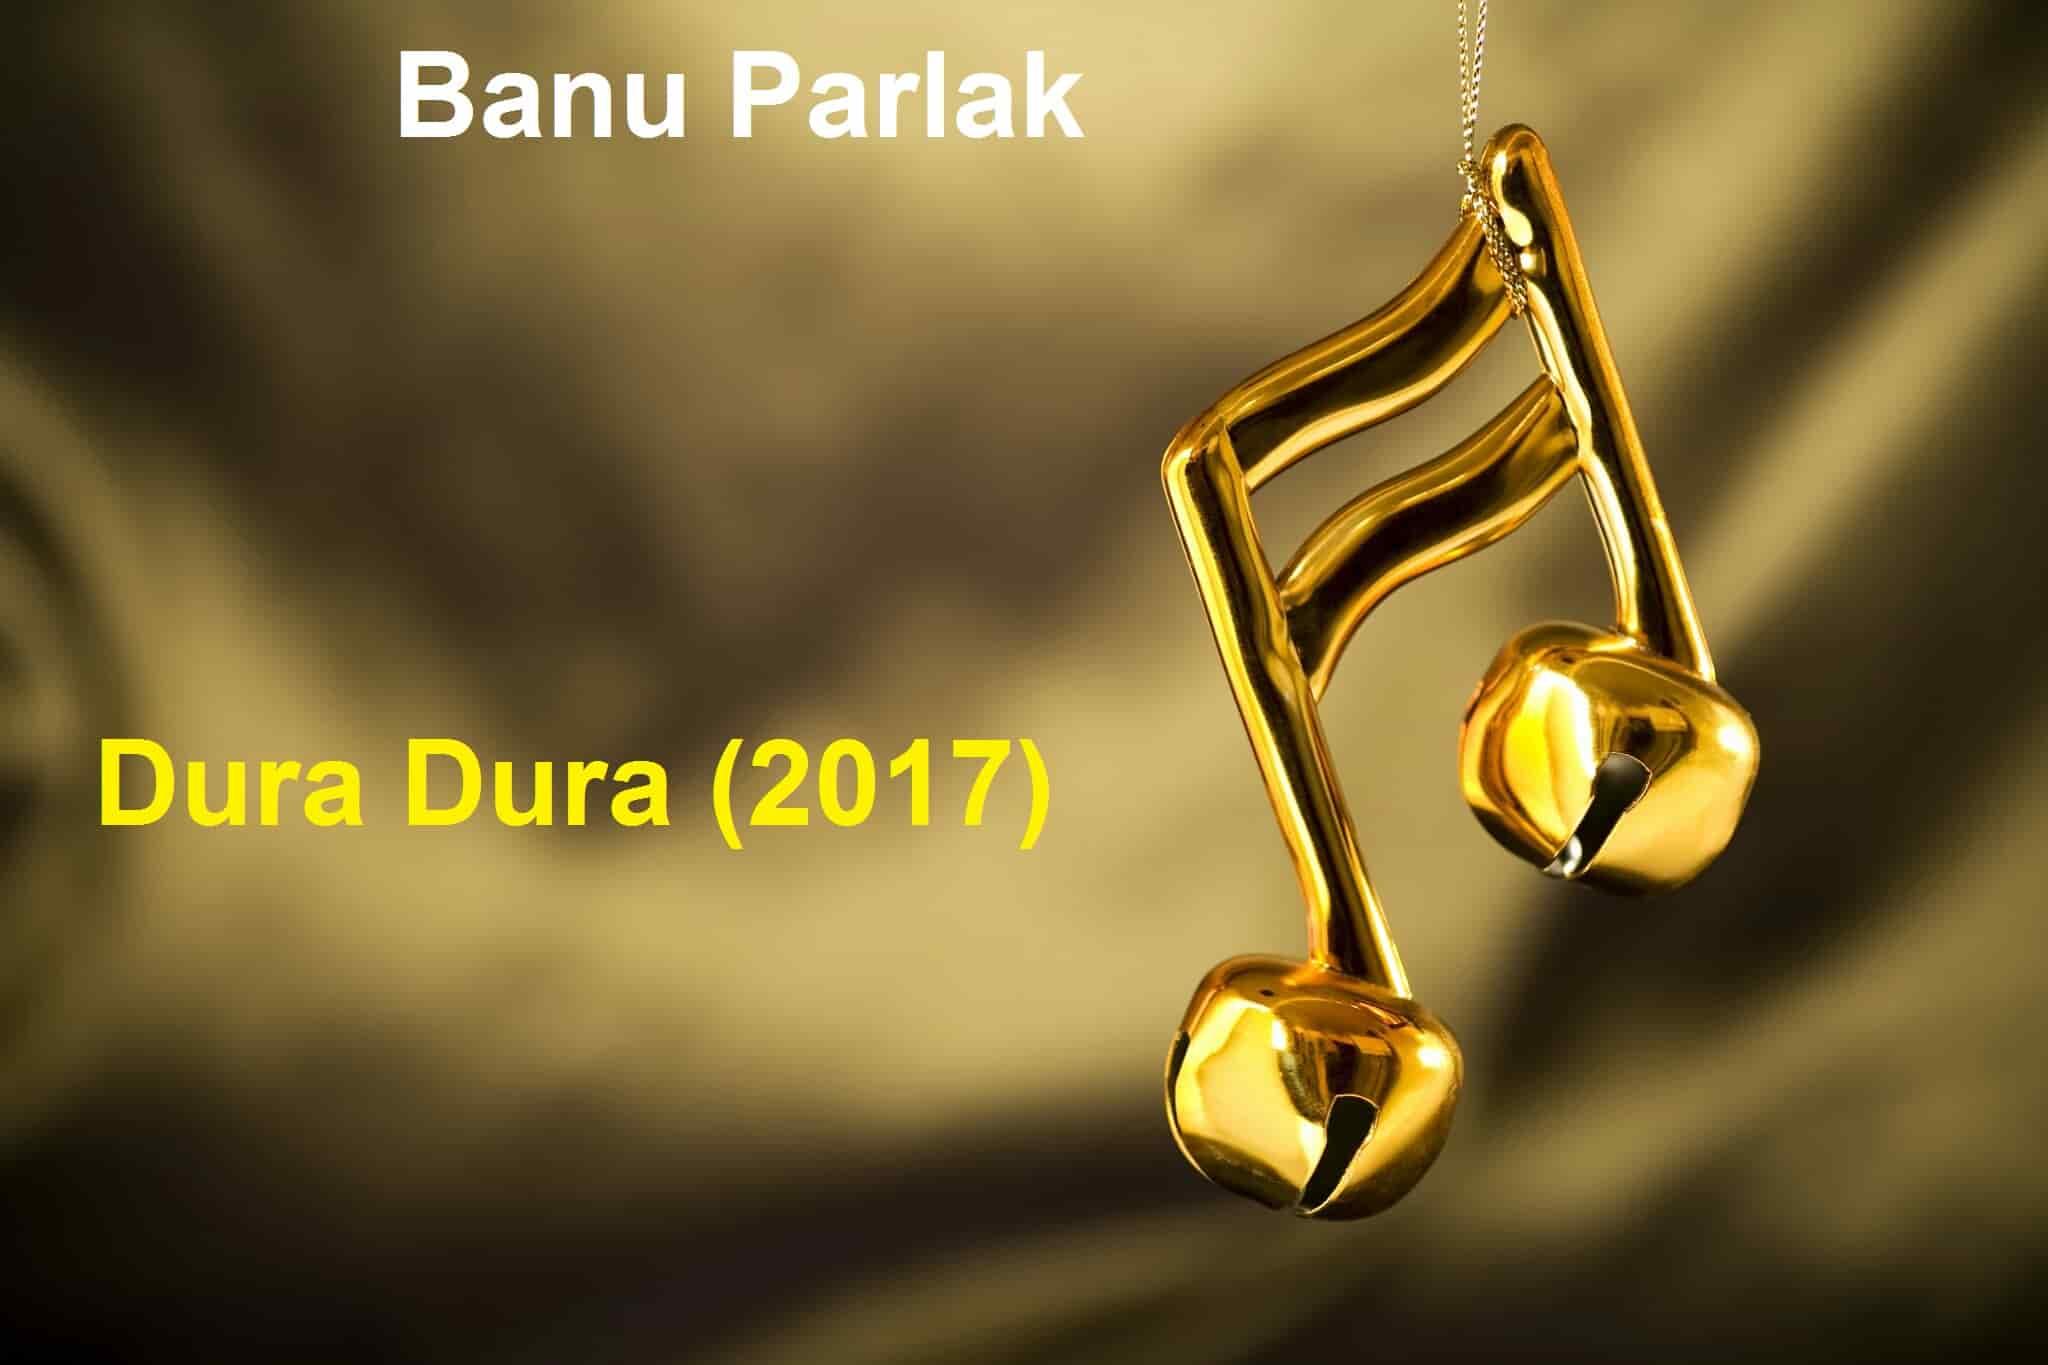 Banu Parlak